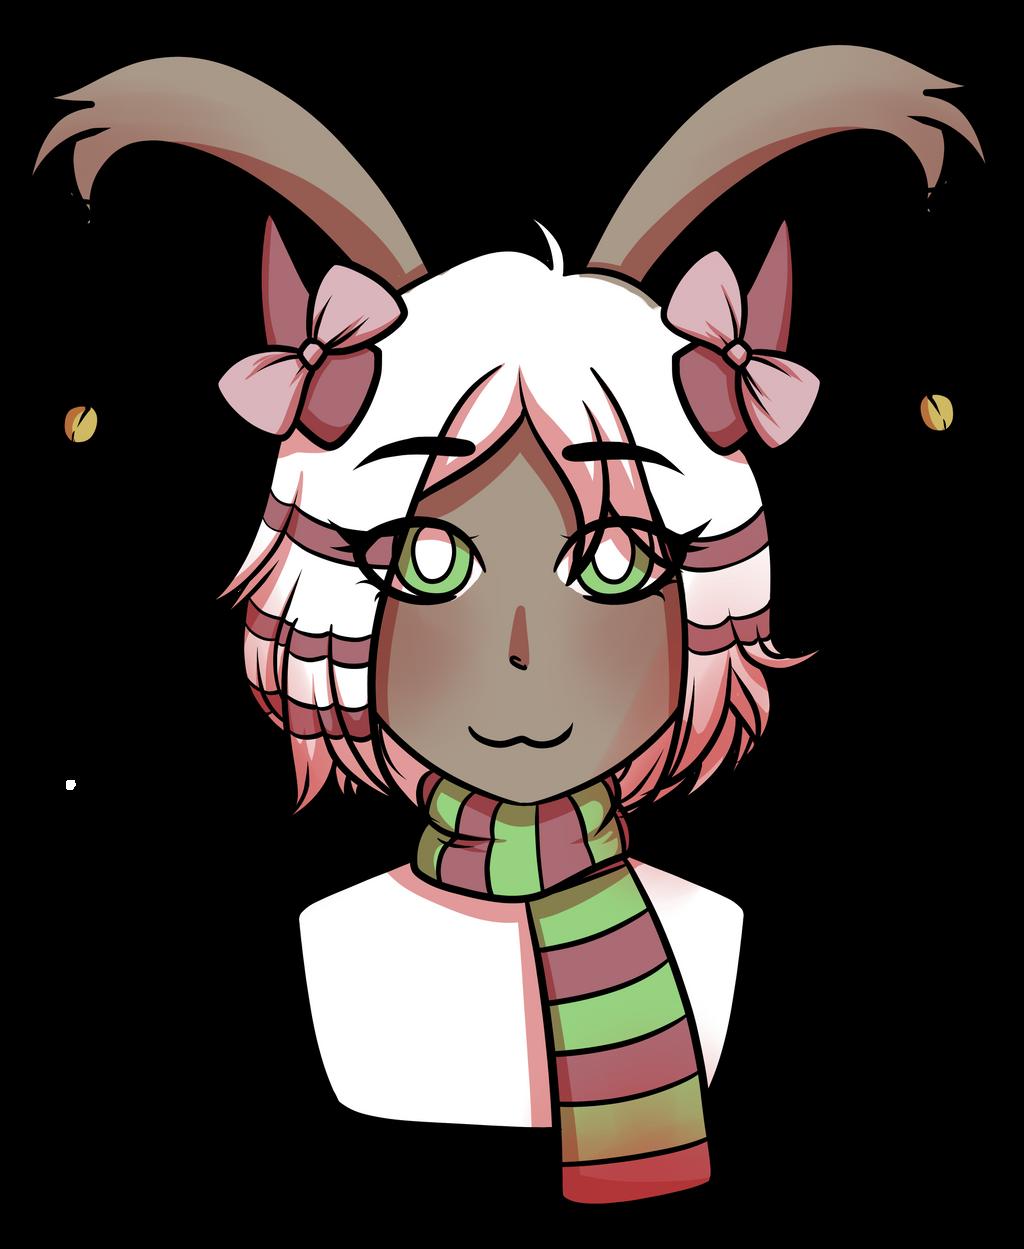 Character Art (Hackers-Unite) by kangaroo722